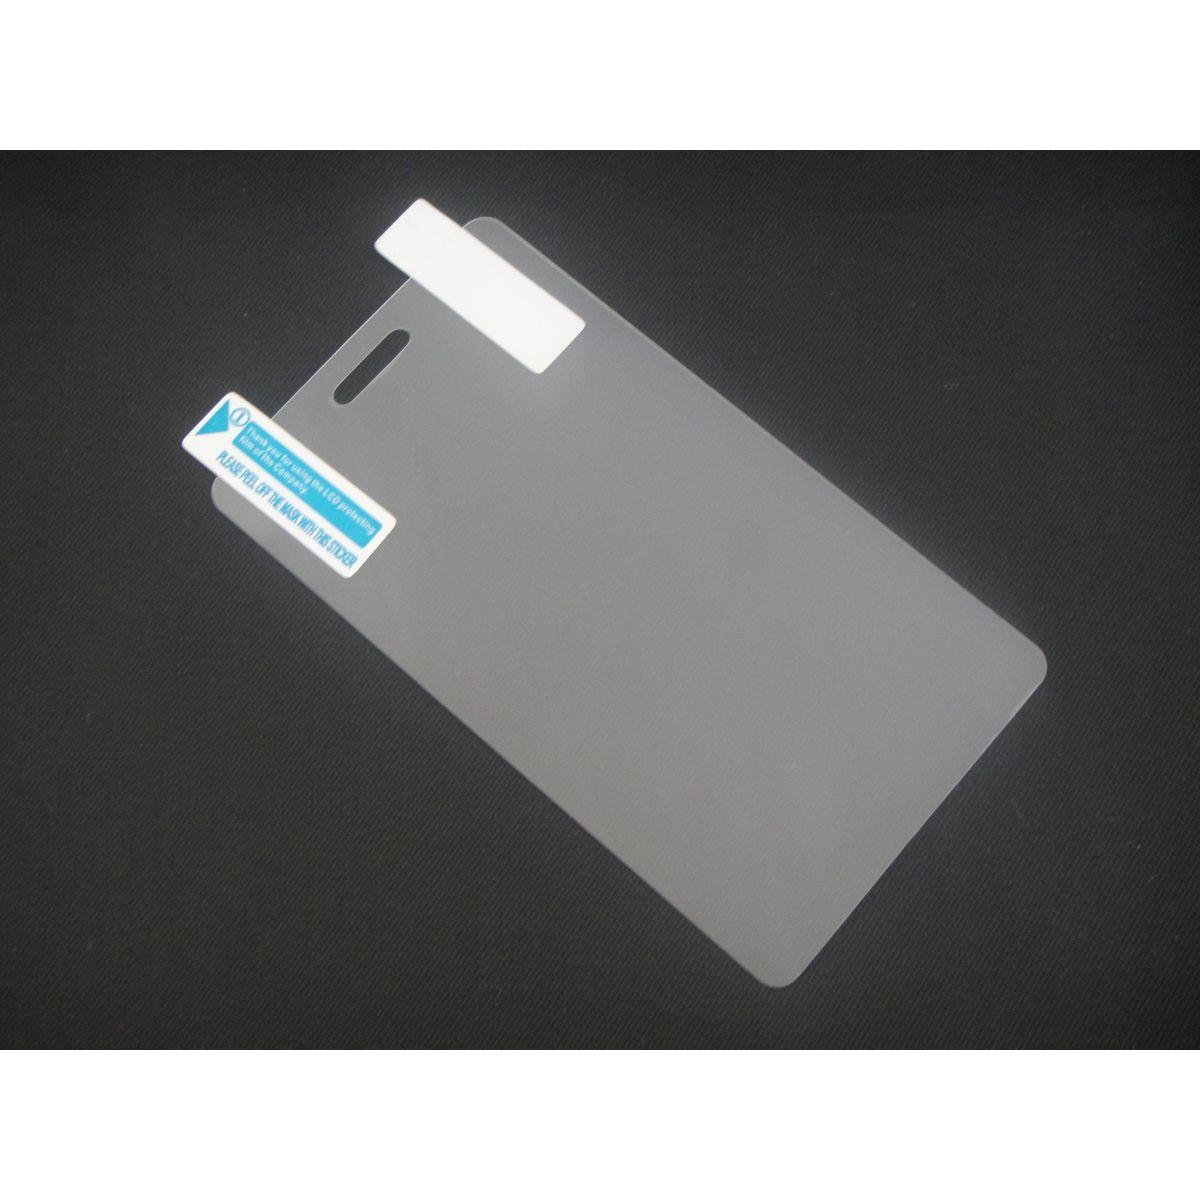 Película Protetora para LG T375 Cookie Smart - Fosca